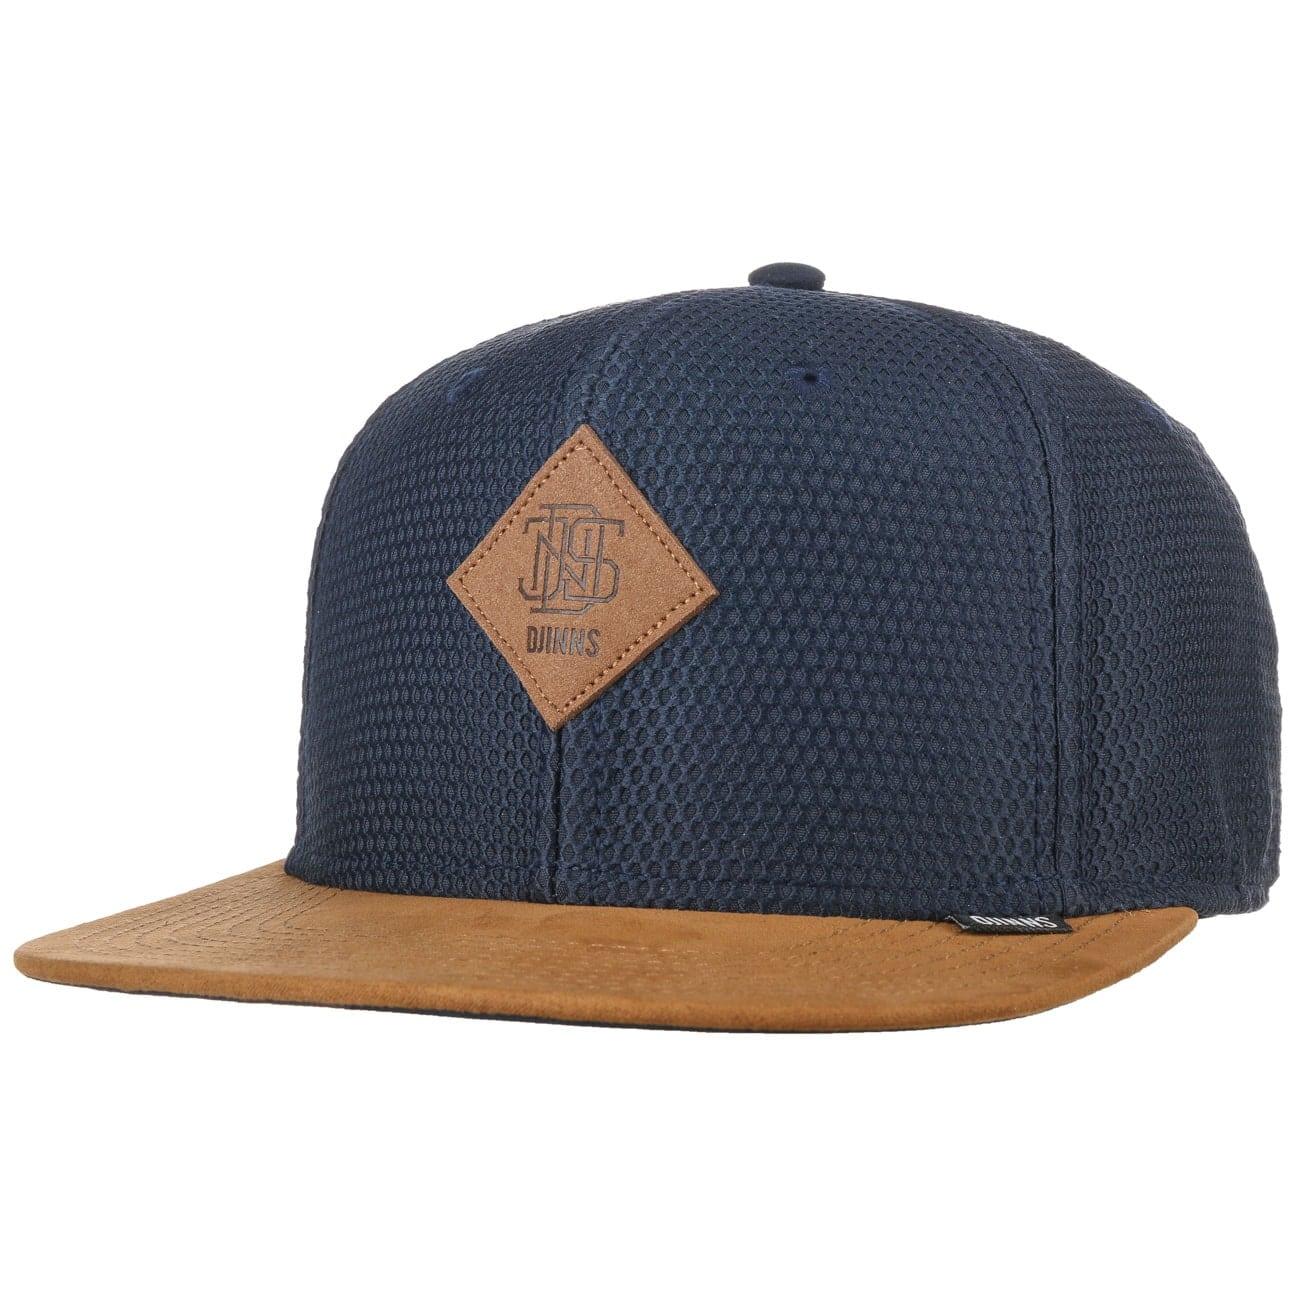 Casquette 6P SB Honey Knit by Djinns  baseball cap